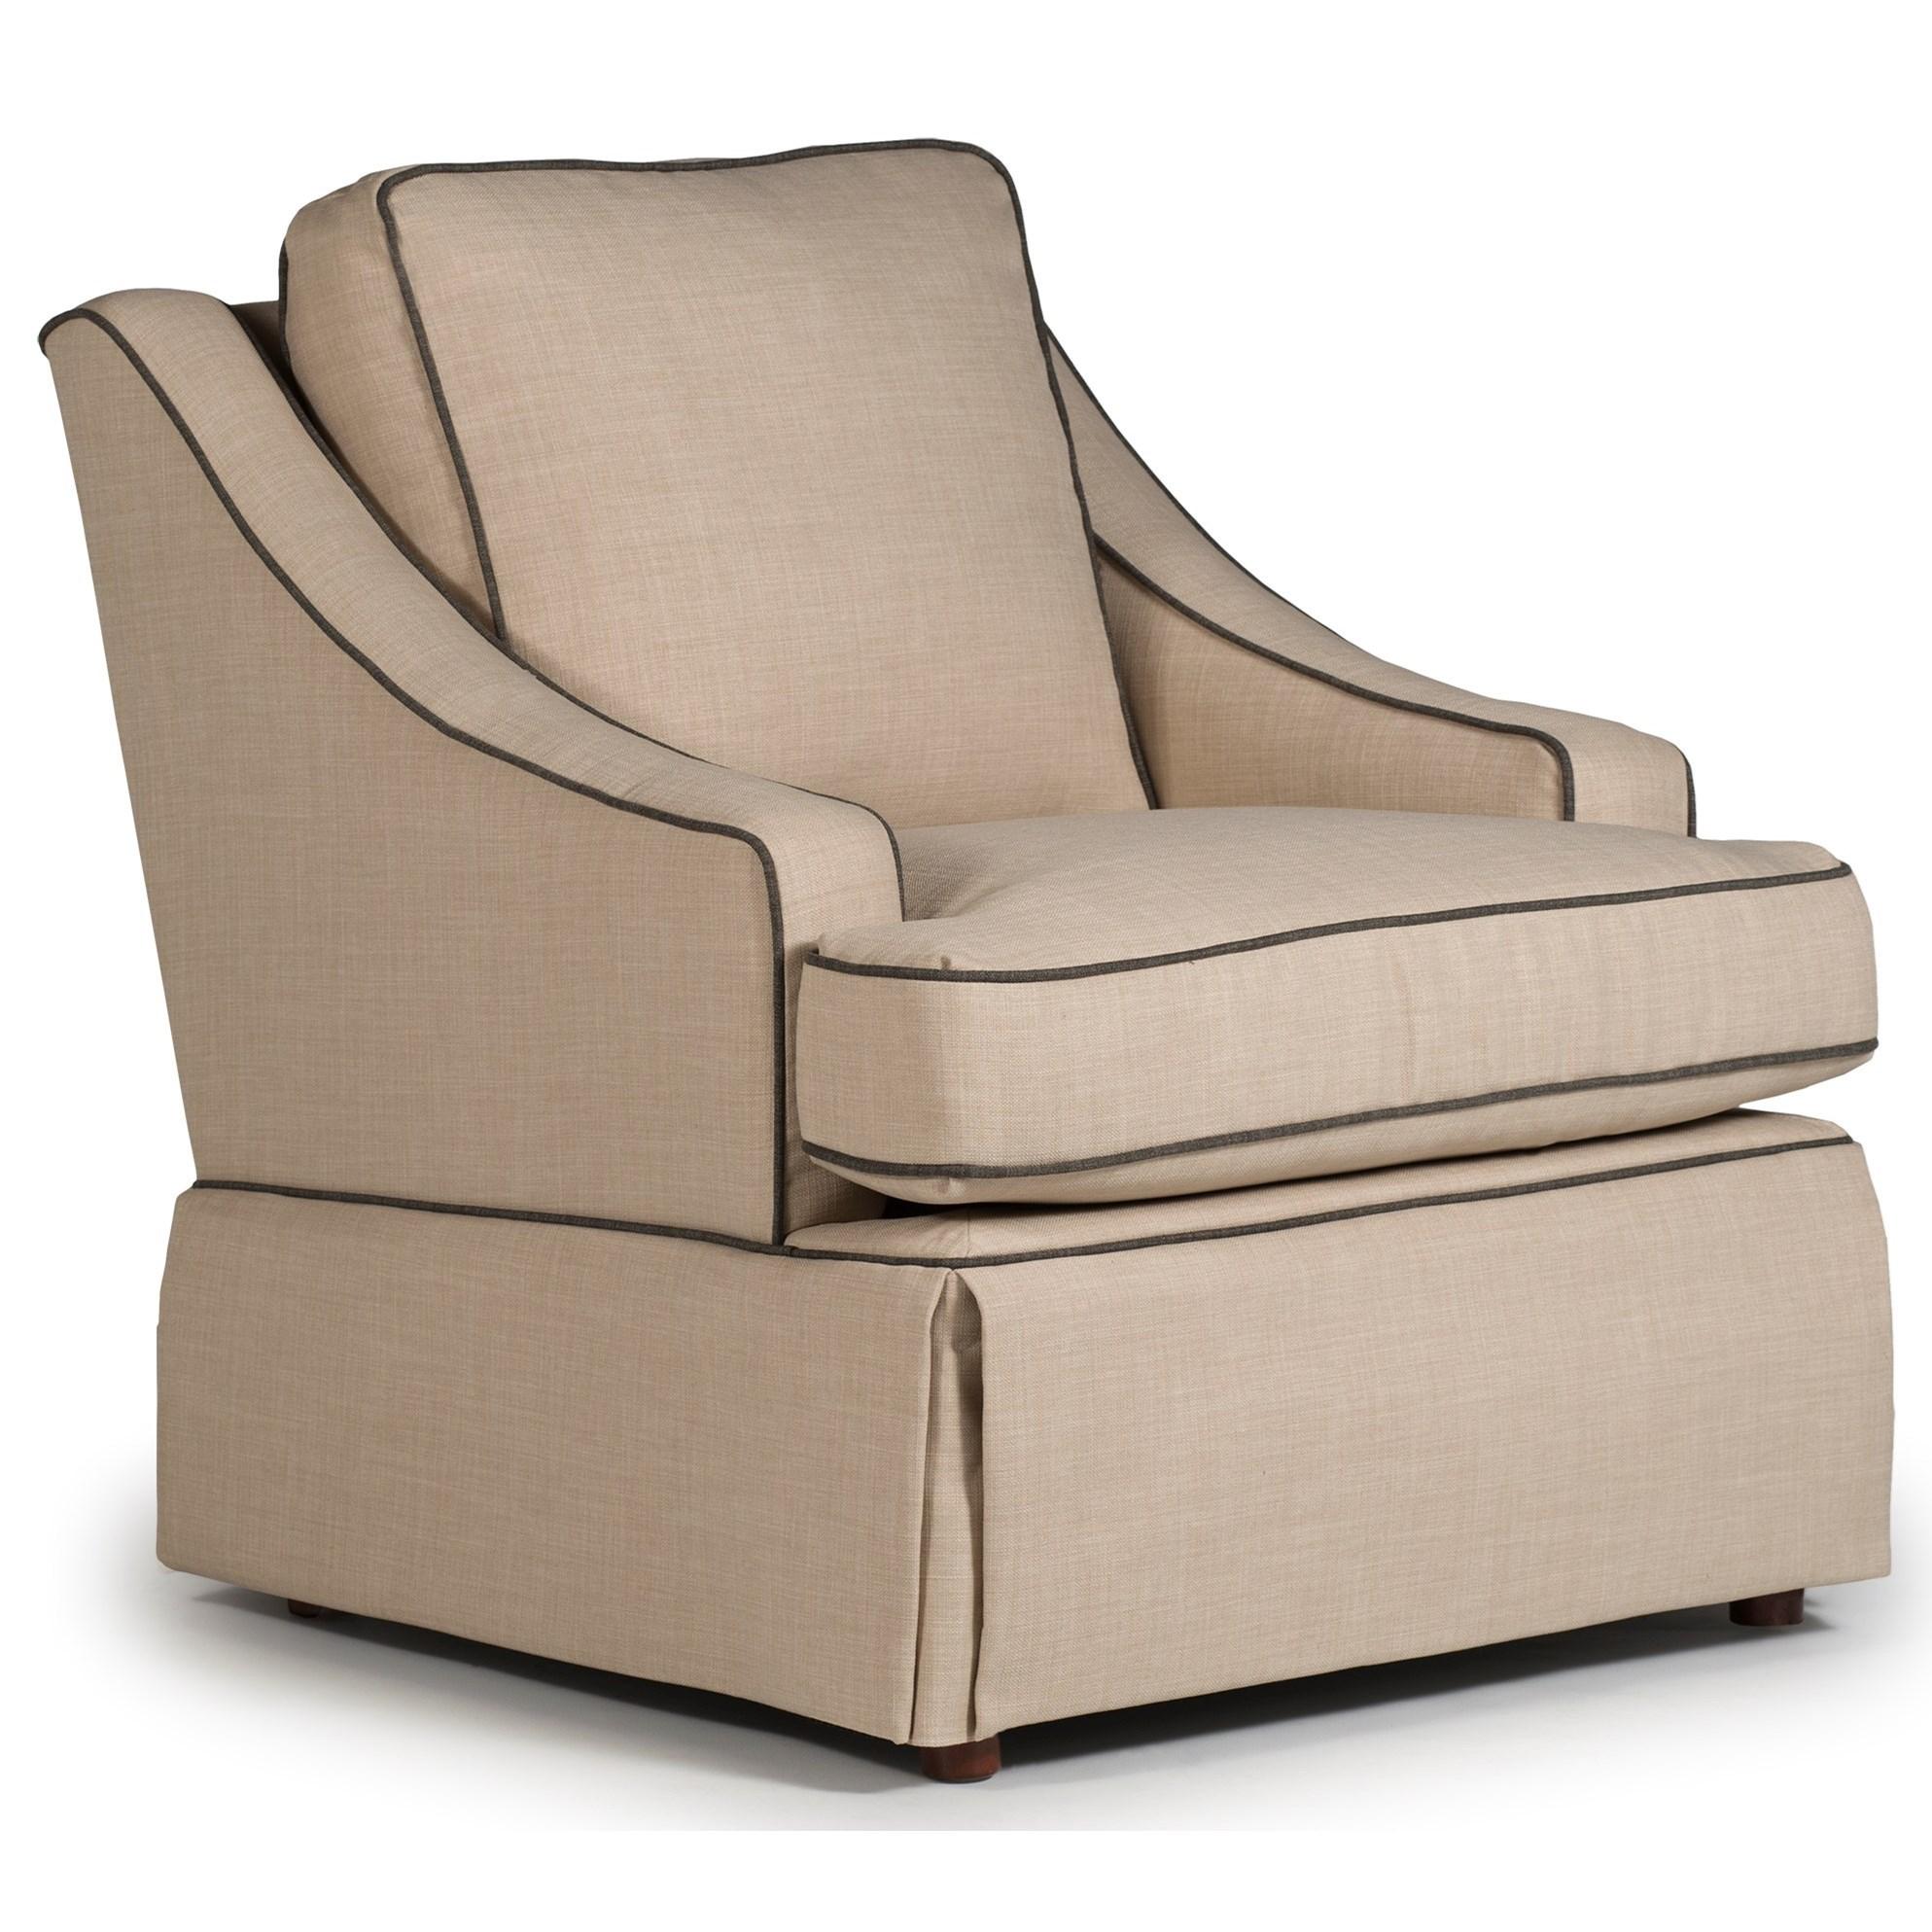 Swivel Glide Chairs Ayla Swivel Glider